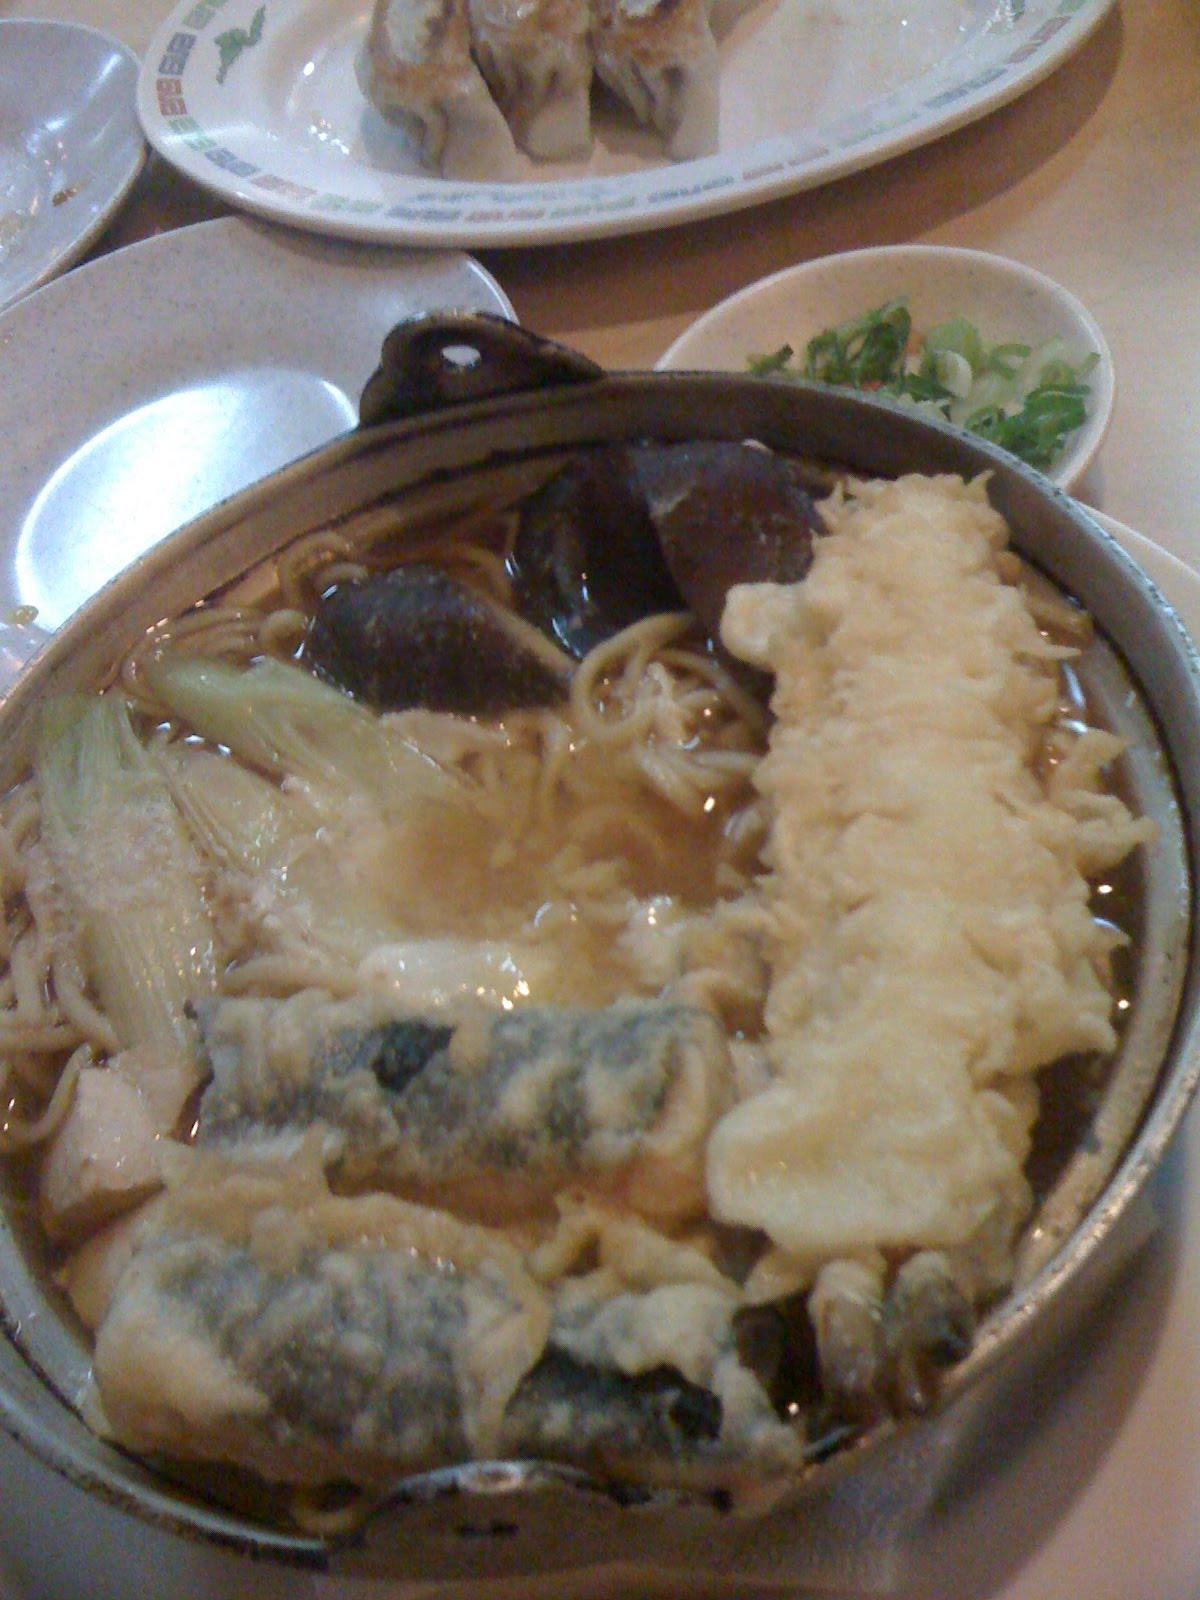 ... vegetable tempura, kani tempura and 2-3 whole pcs of shiitake mushroom